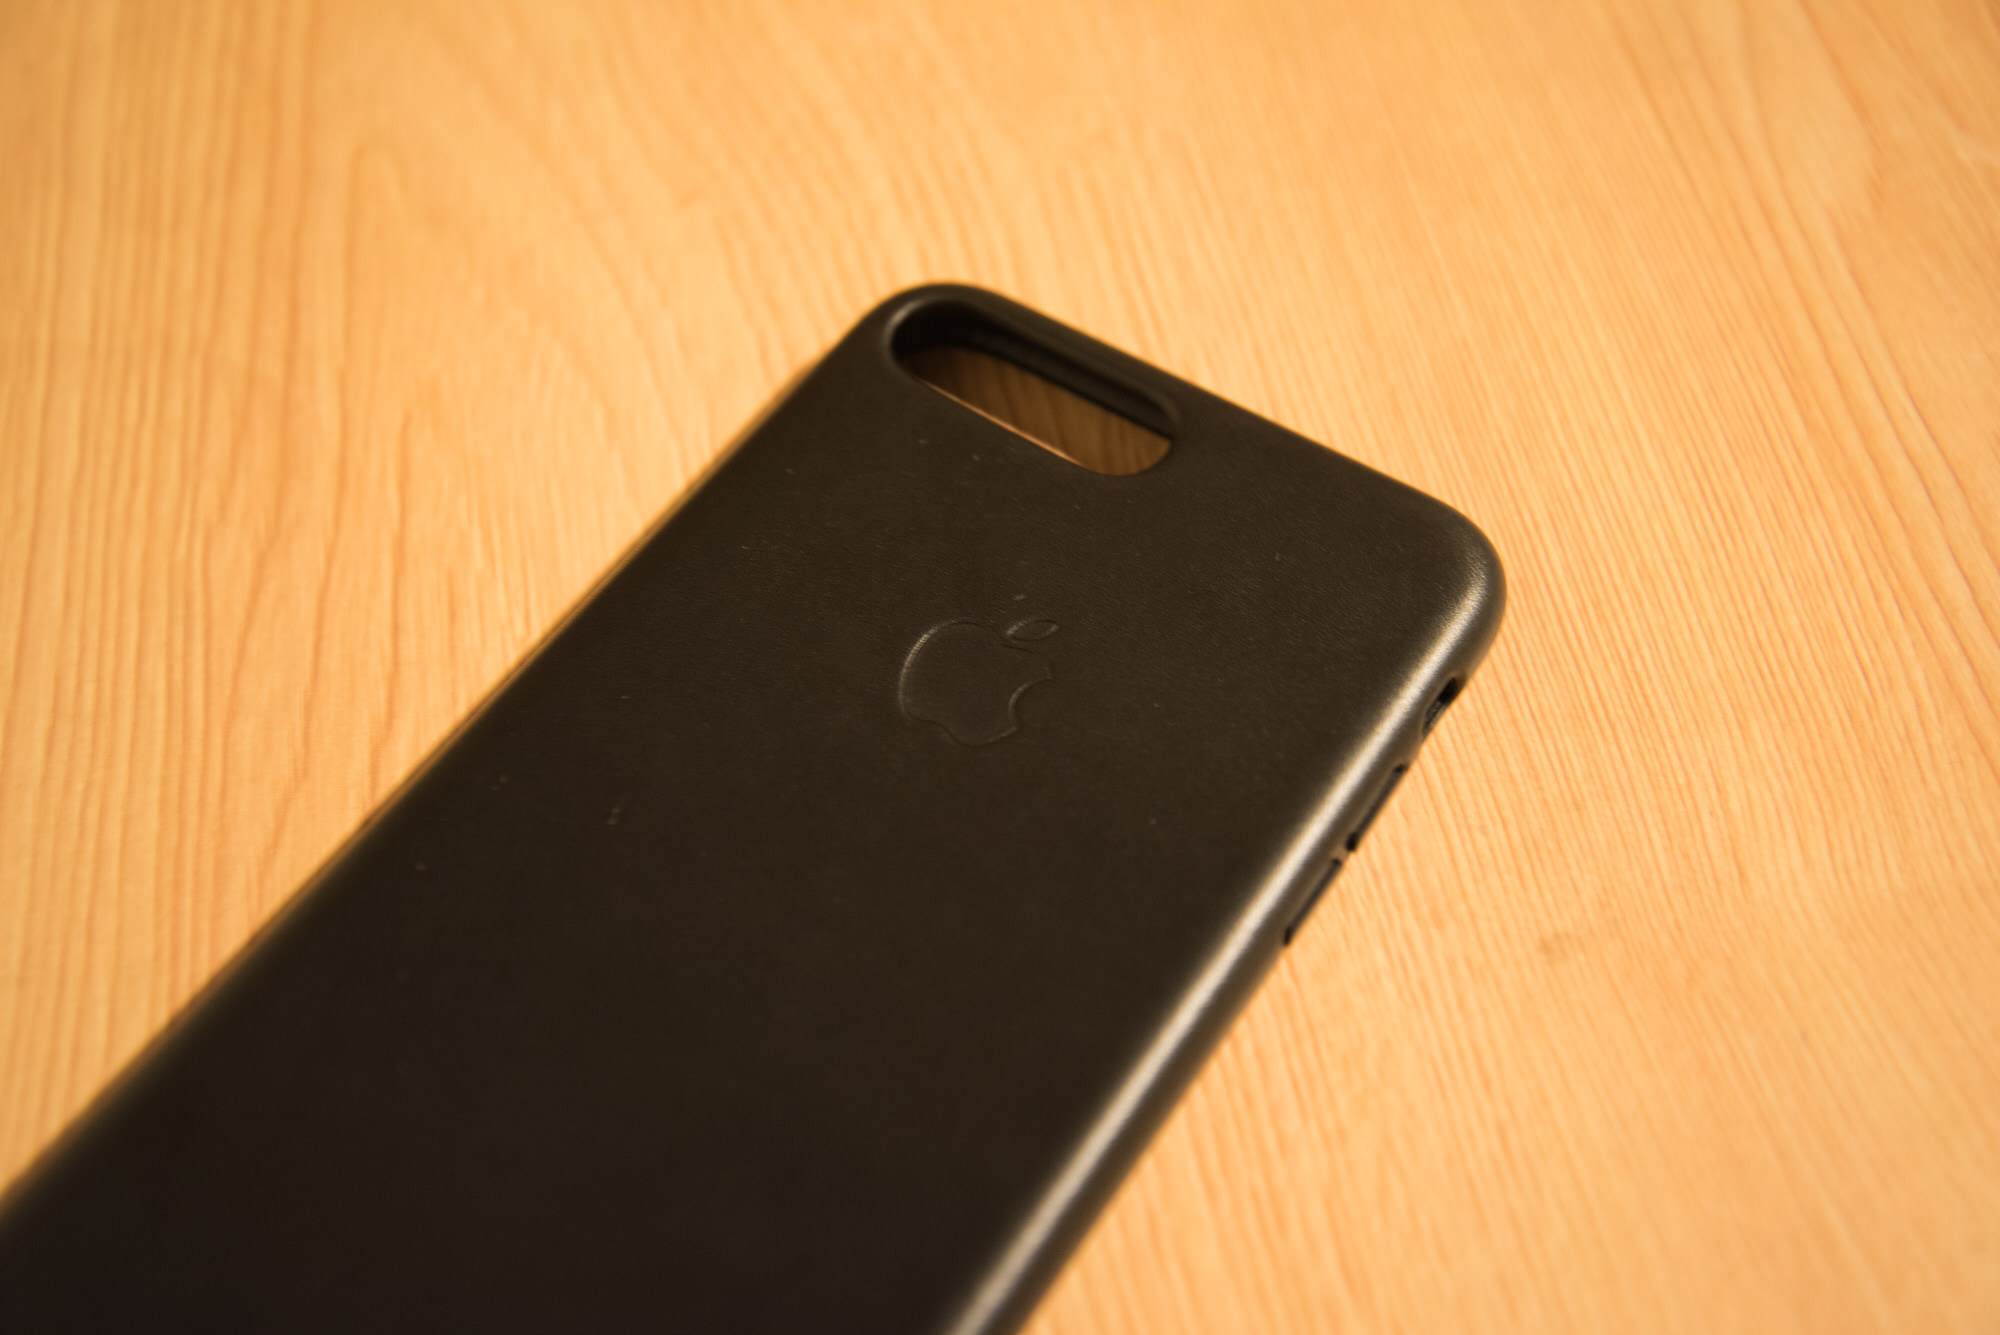 Iphone7plus leathercase 4